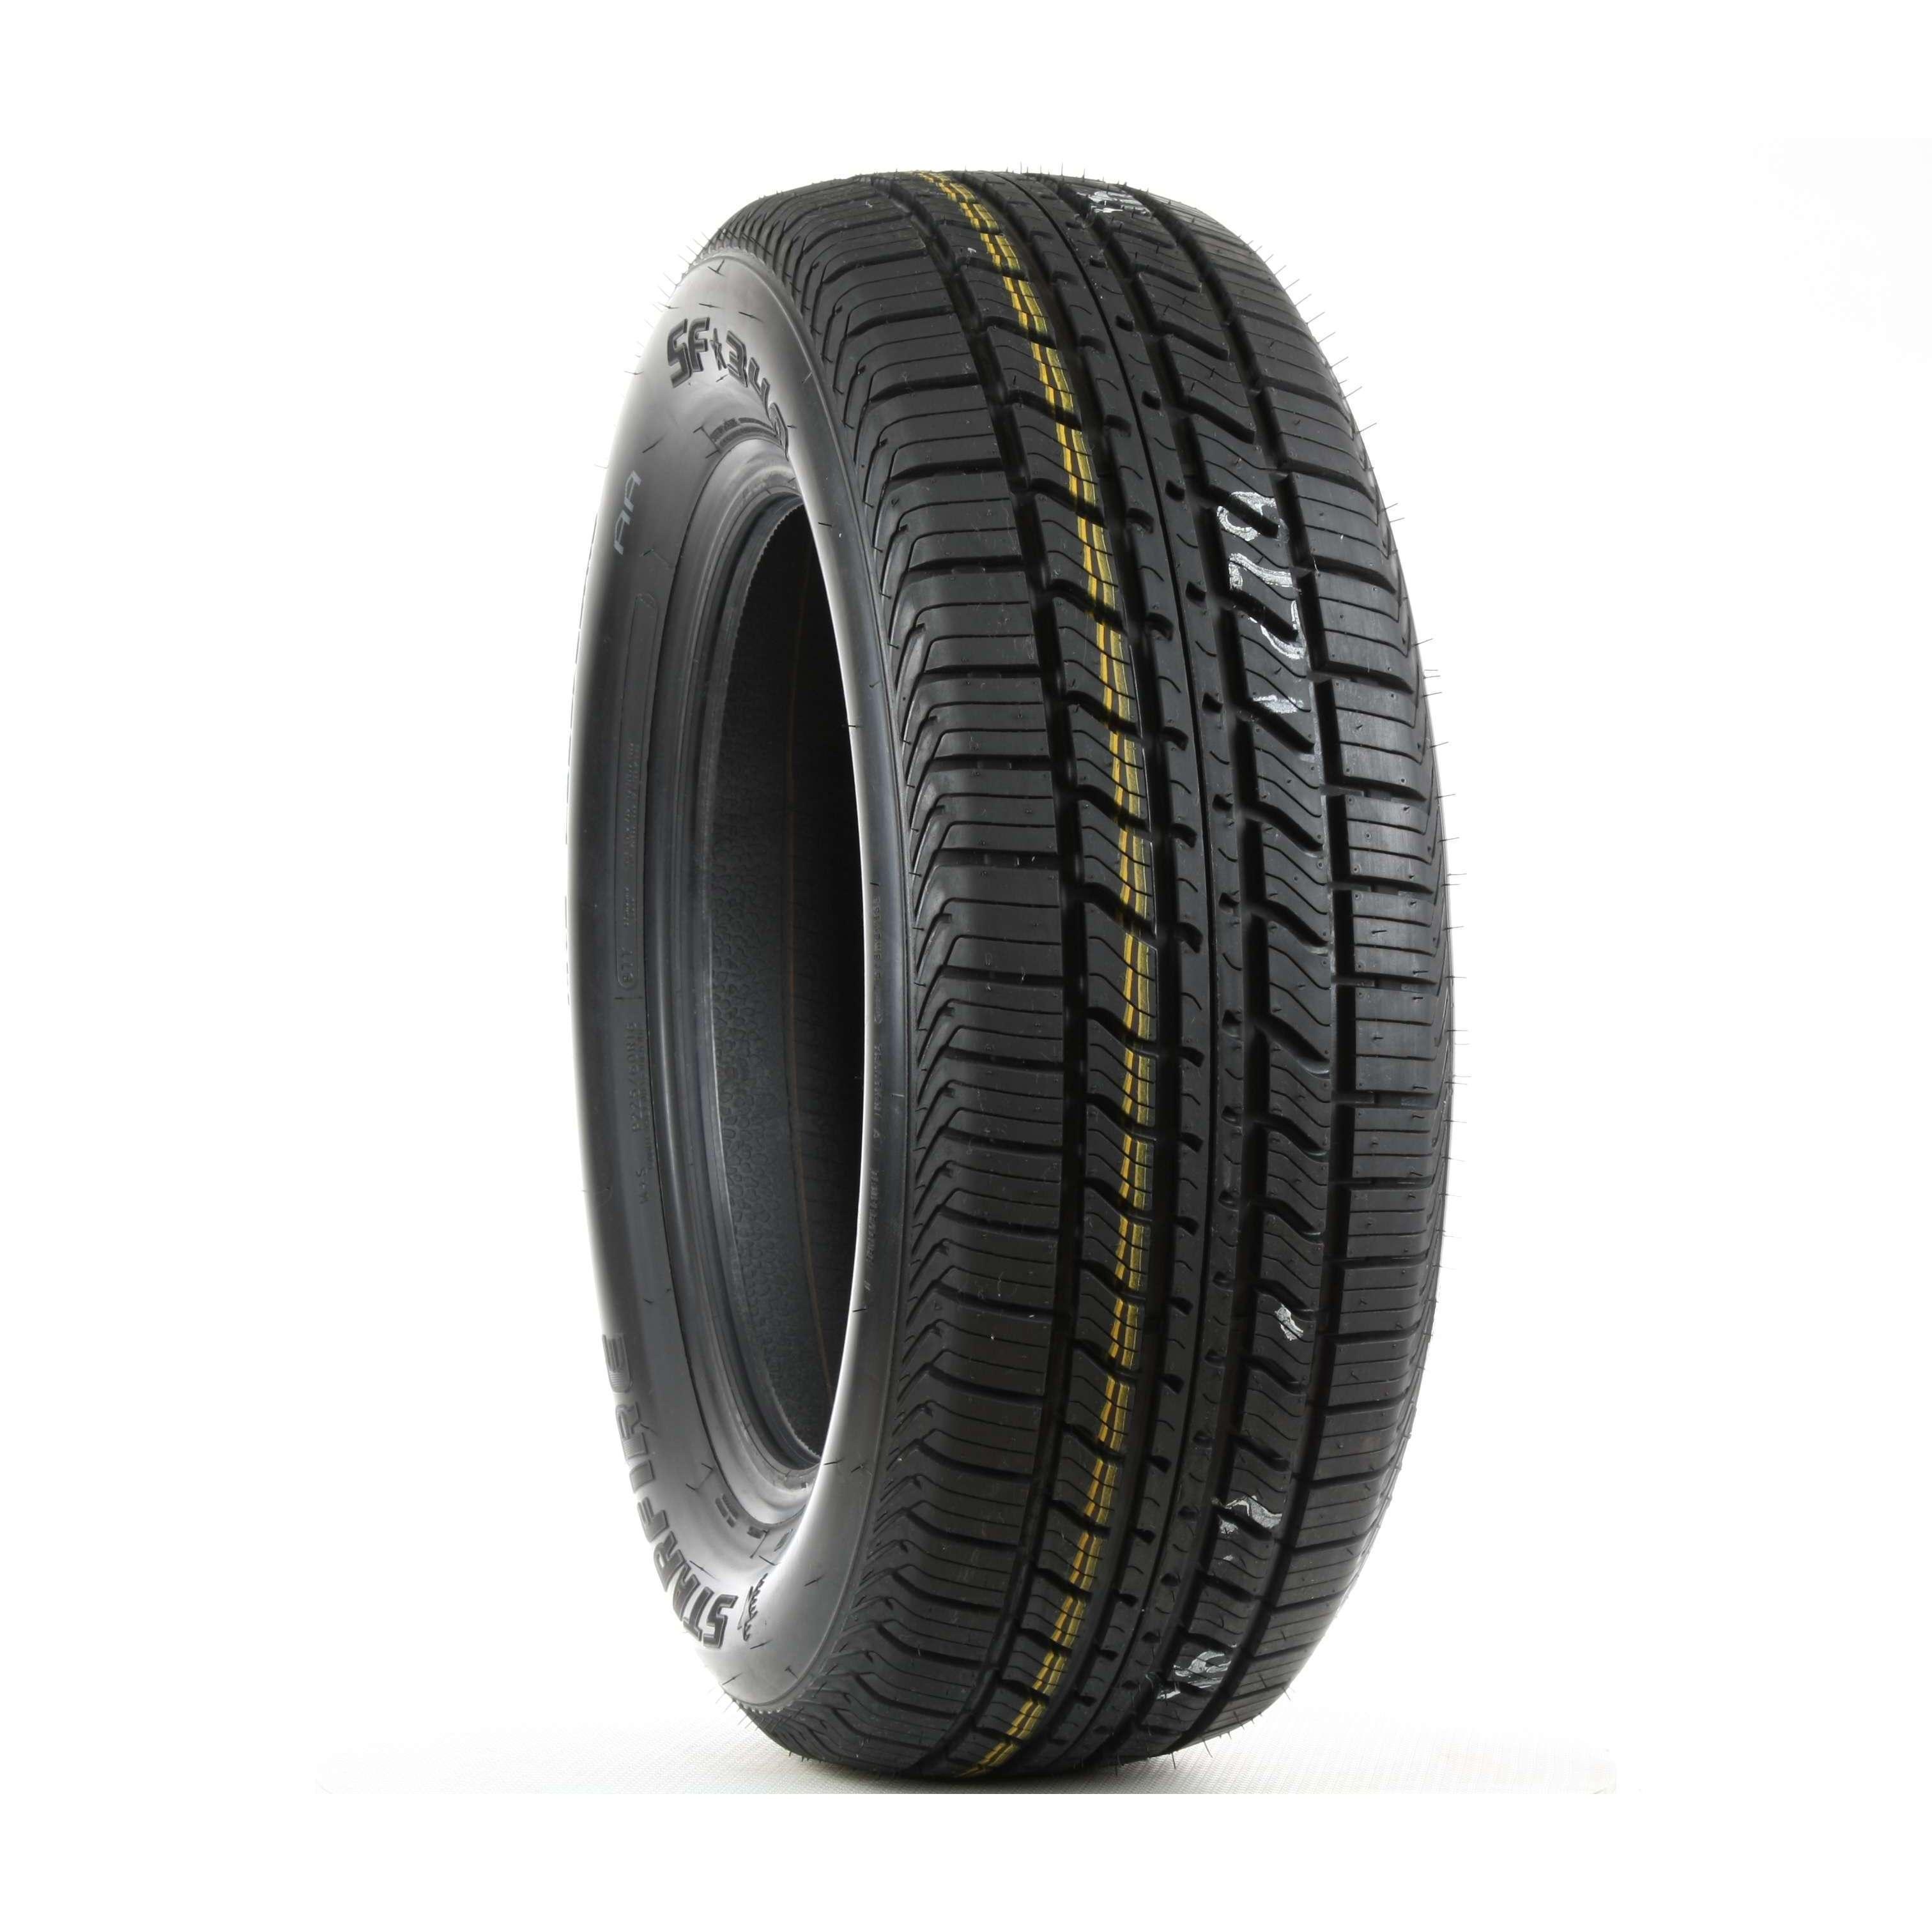 Starfire SF-340 All Season Tire - 205/65R15 92T (Black)